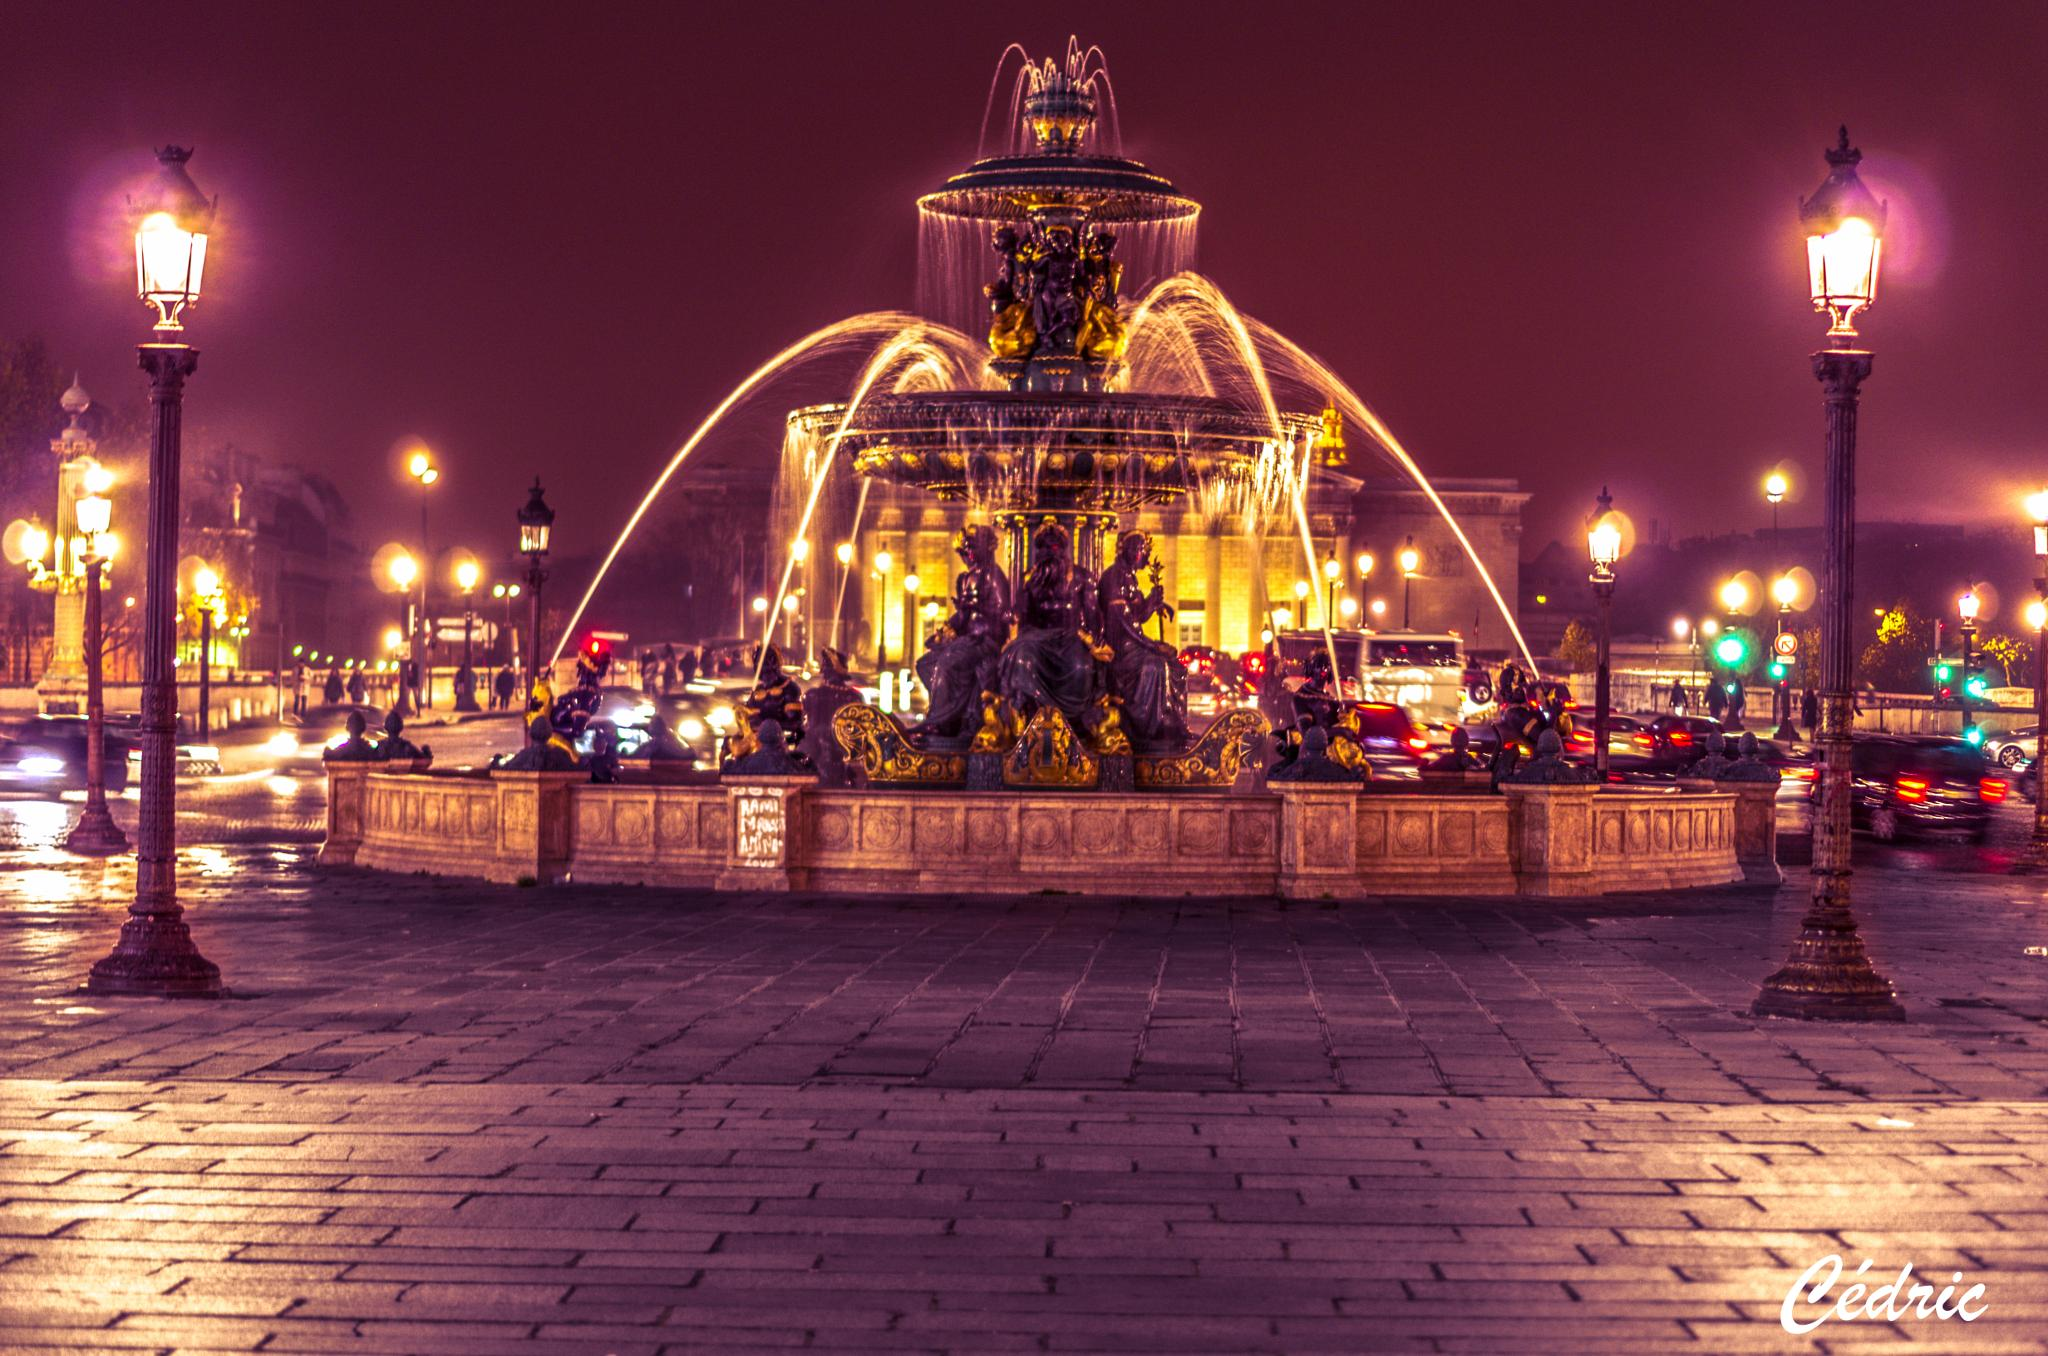 place de la concorde, paris by cedricloy8